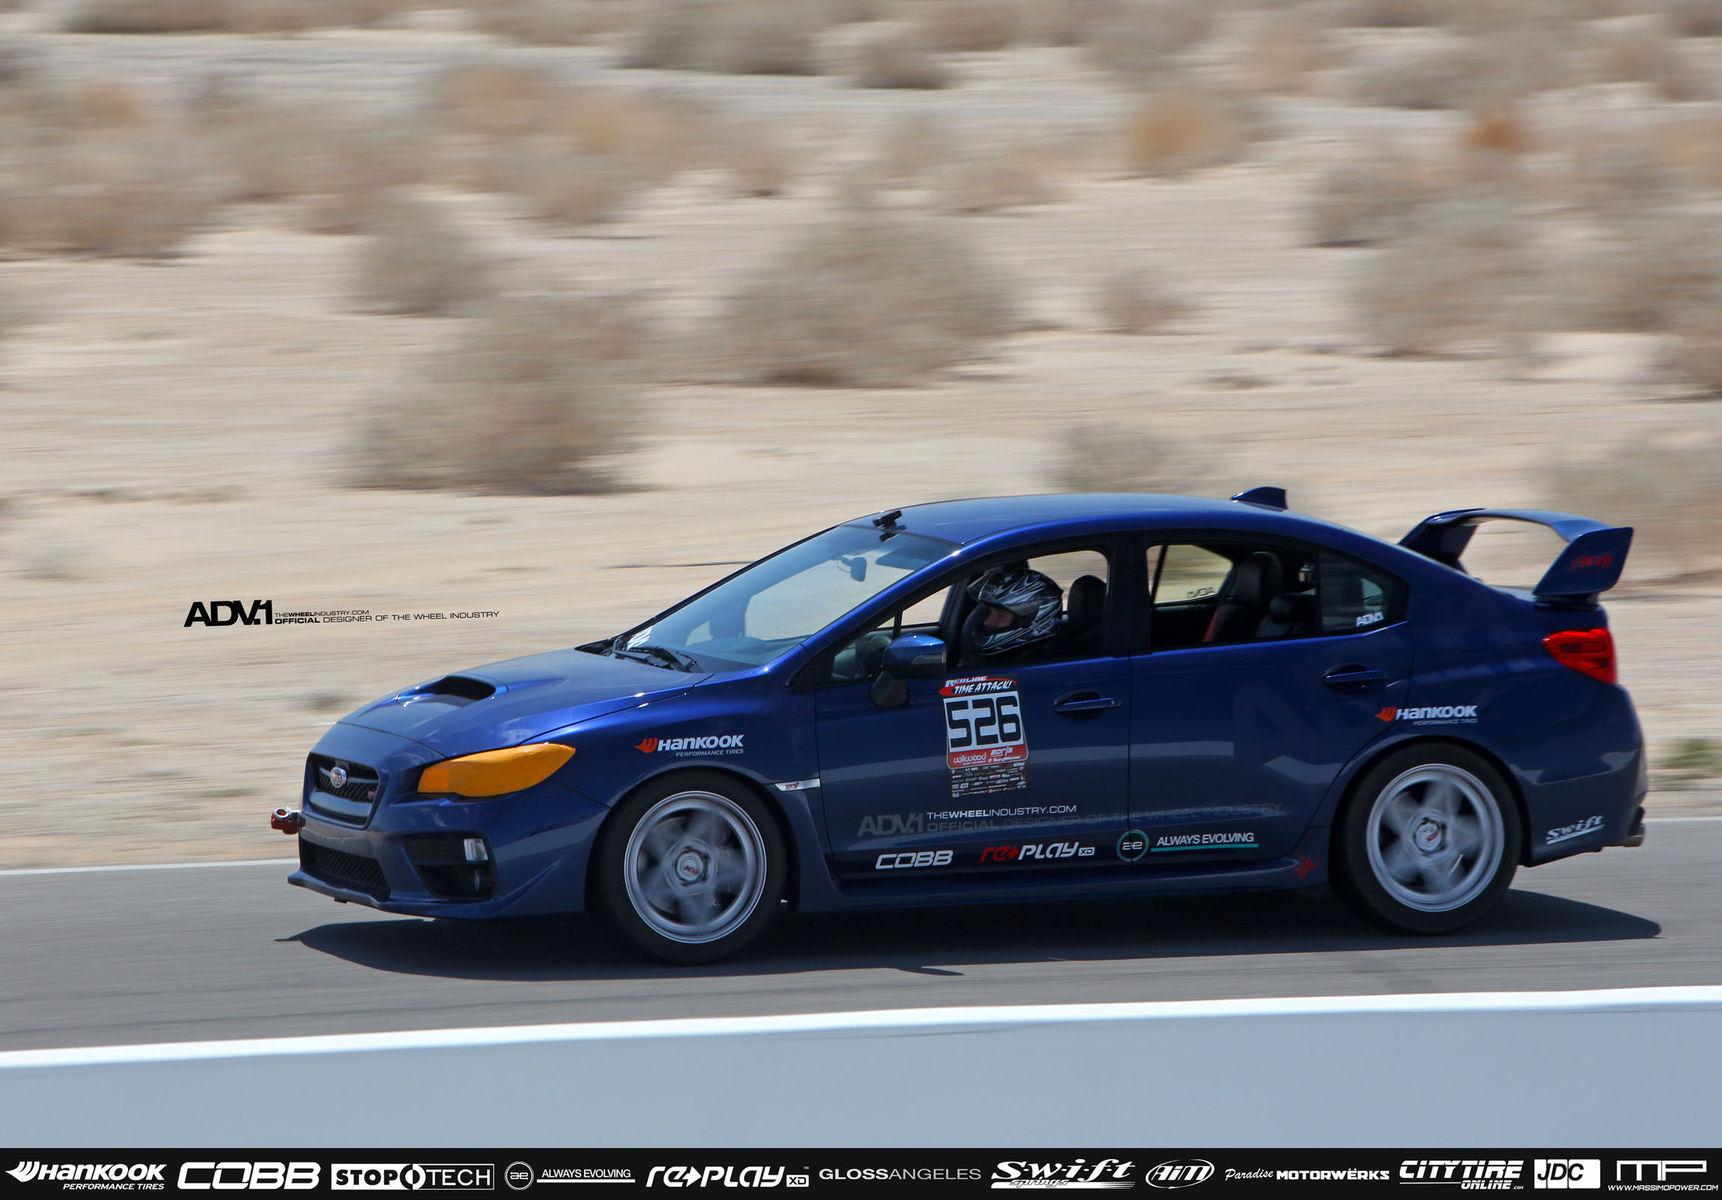 2015 Subaru WRX | SUBARU STI ADV5S REDLINE TIME ATTACK: ROUND 3 - CHUCKWALLA VALLEY RACEWAY - MAY 3